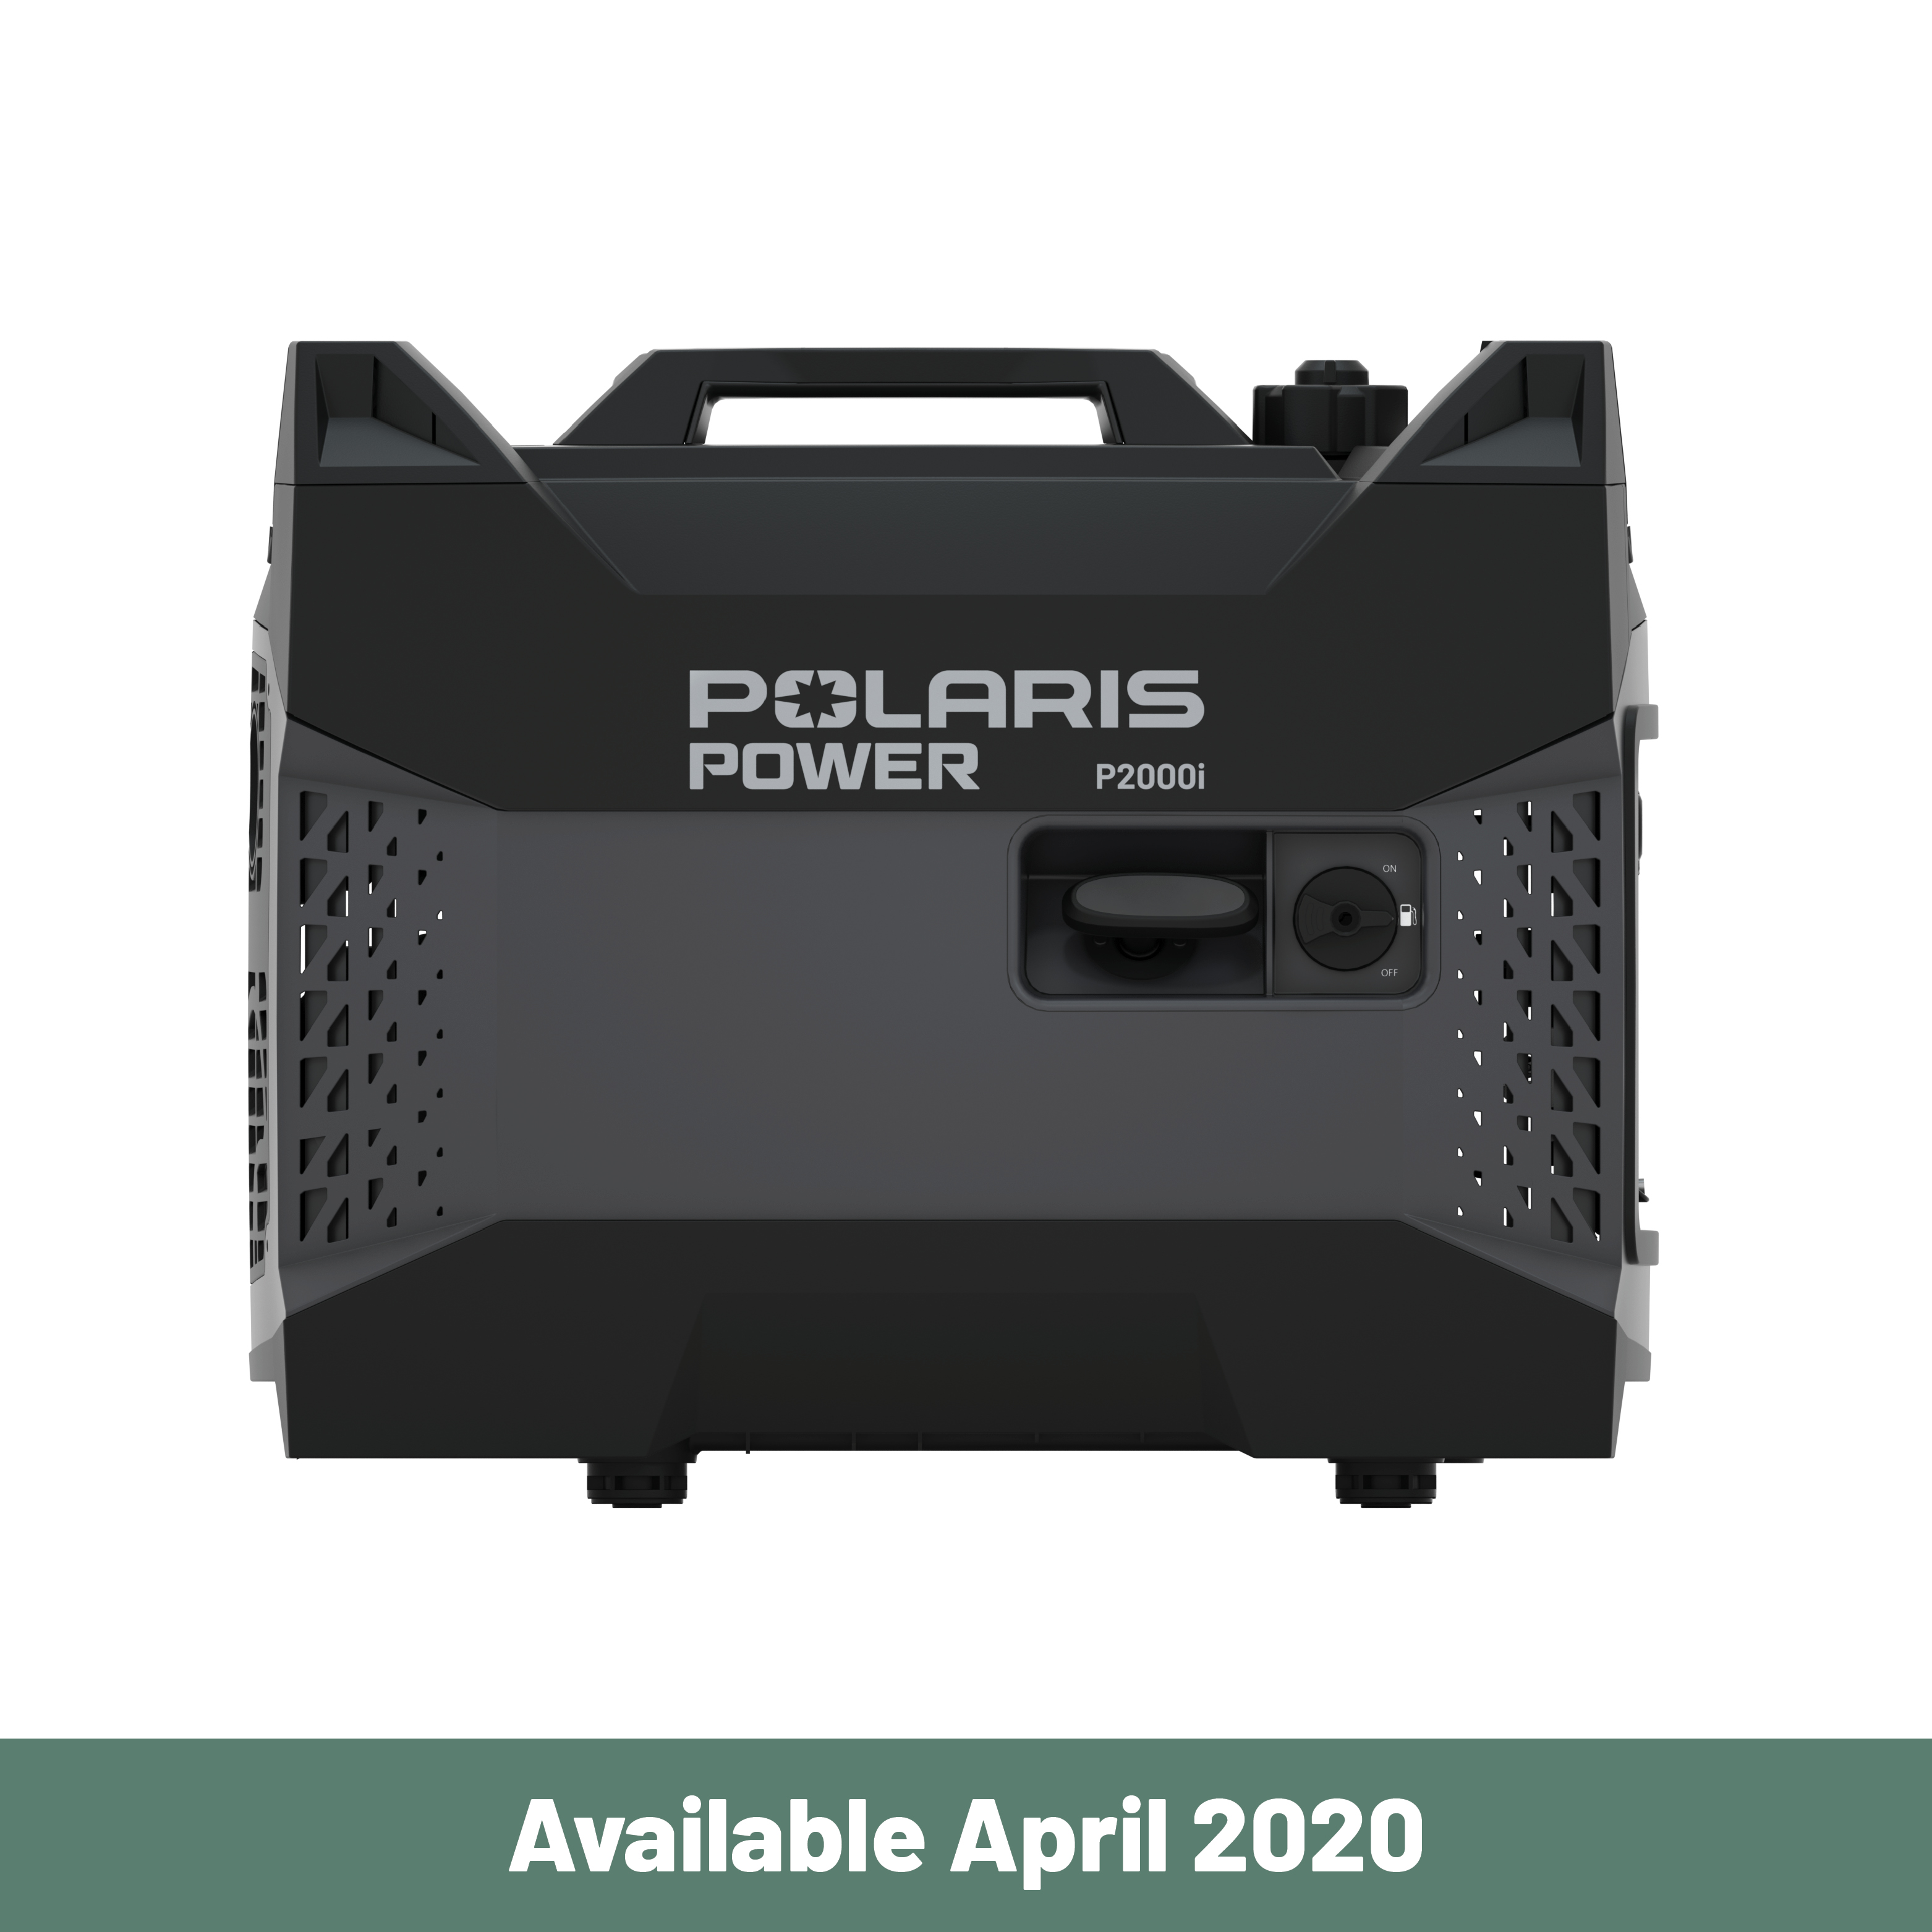 P2000i Polaris Power Portable Inverter Generator